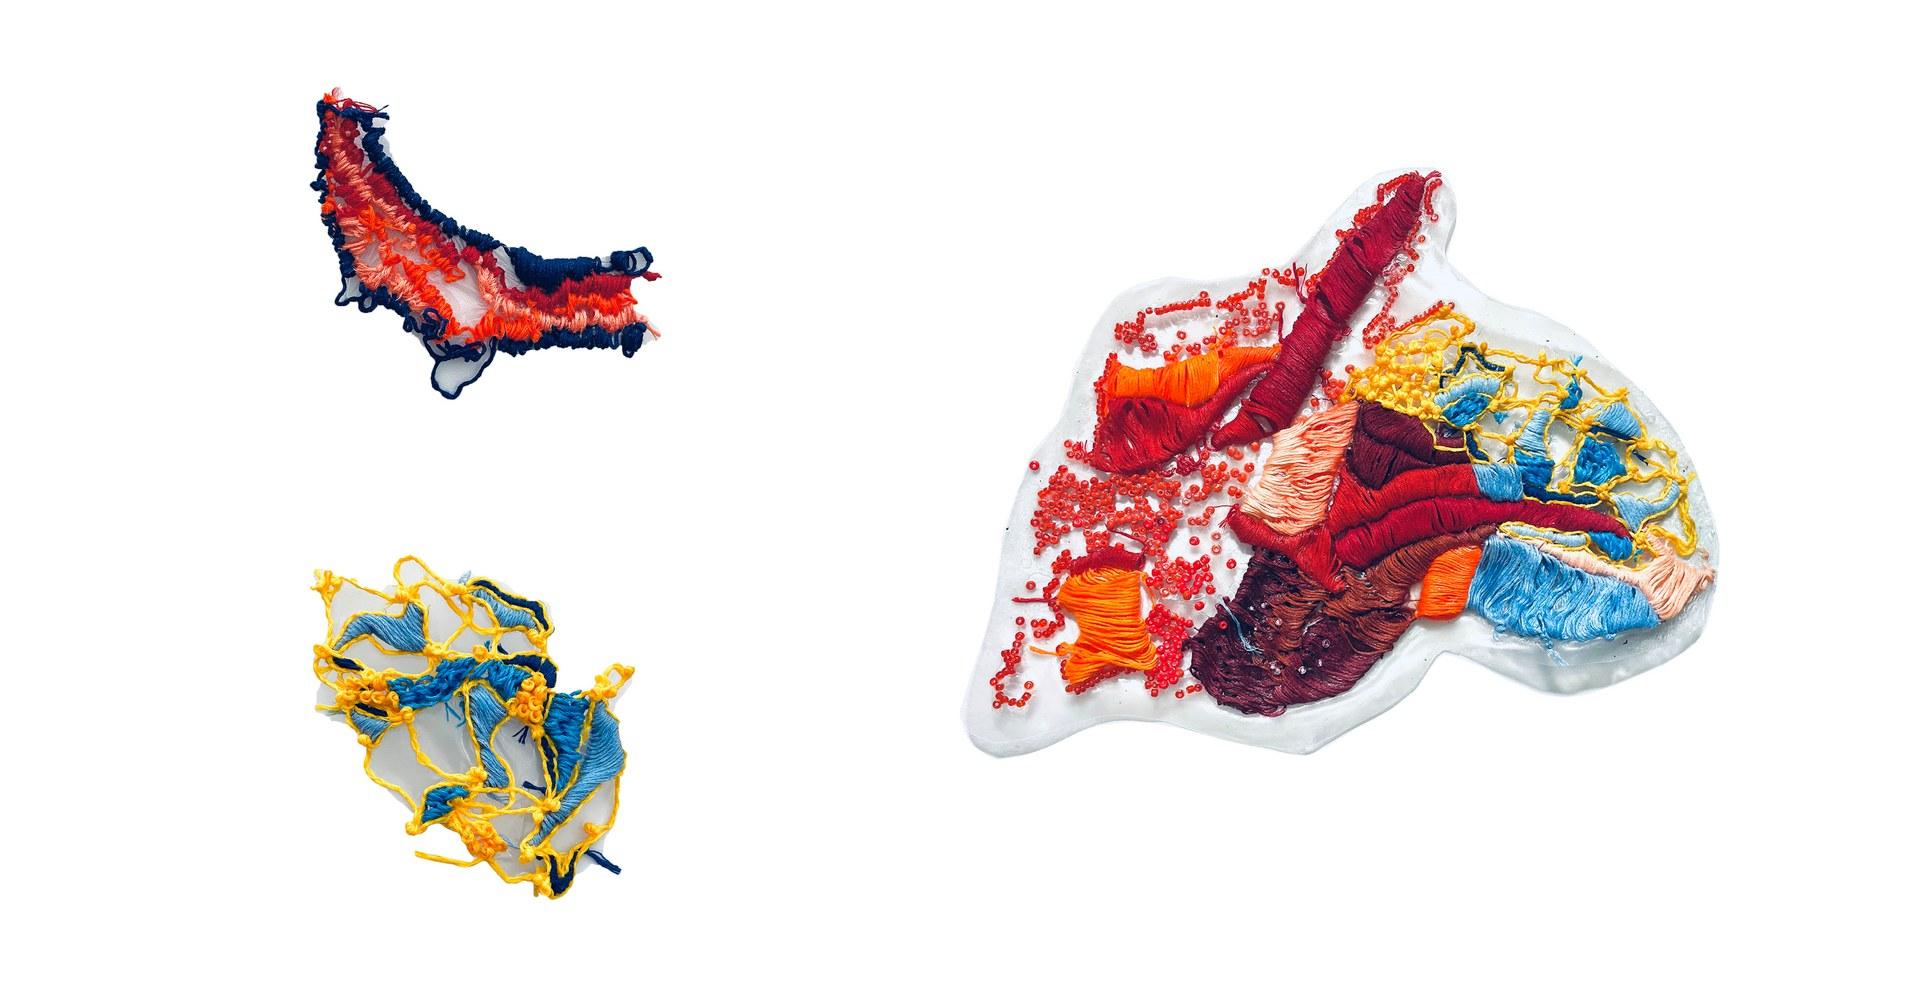 Bio-plastic embroidery samples